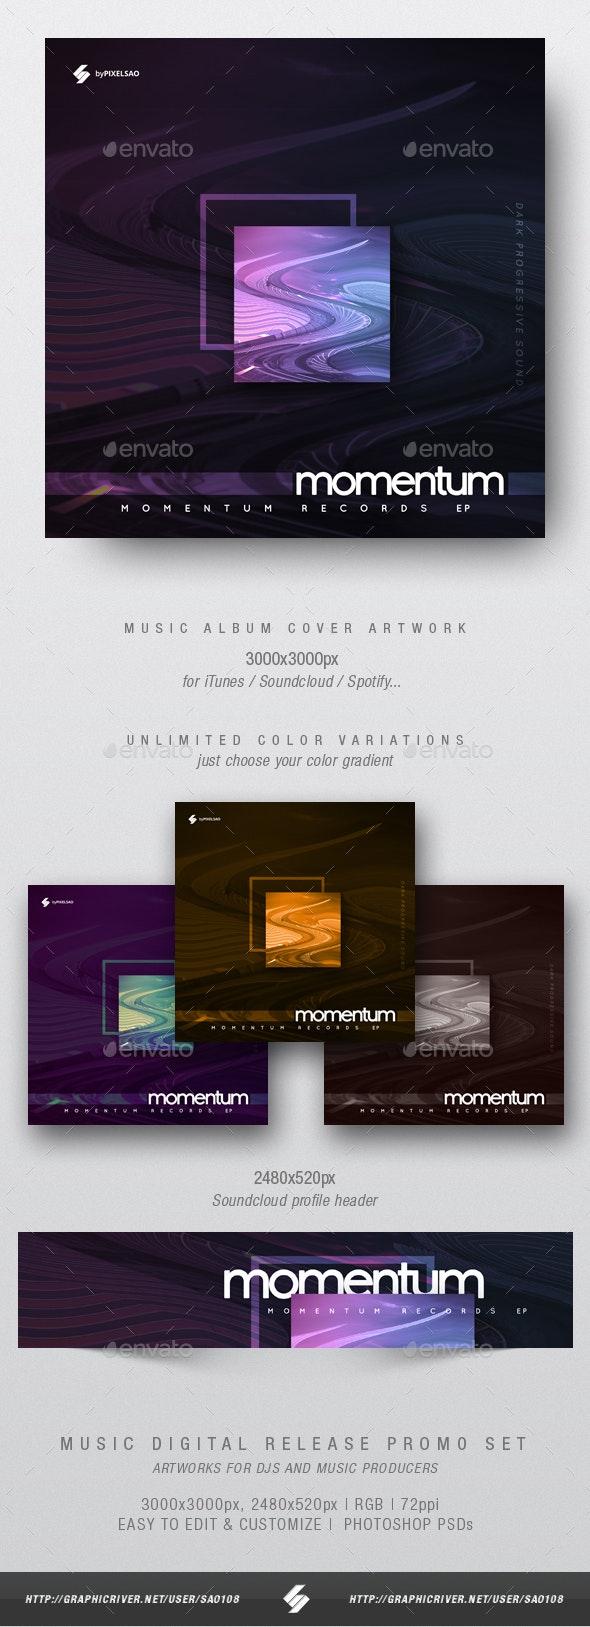 Momentum - Minimal Album Cover Artwork Template - Miscellaneous Social Media